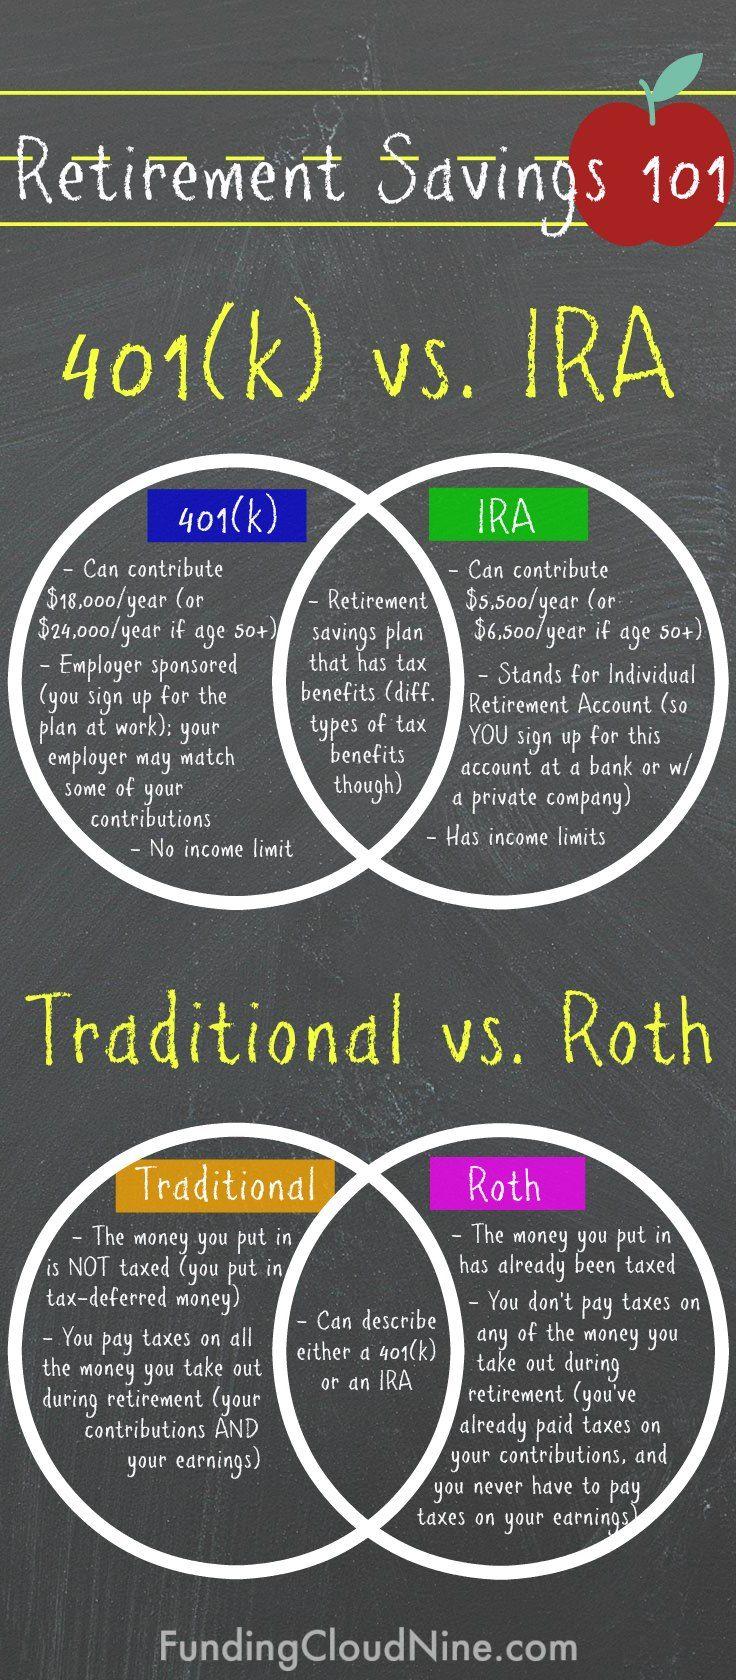 401k vs IRA & Traditional vs Roth: The Basics | FundingCloudNine.com